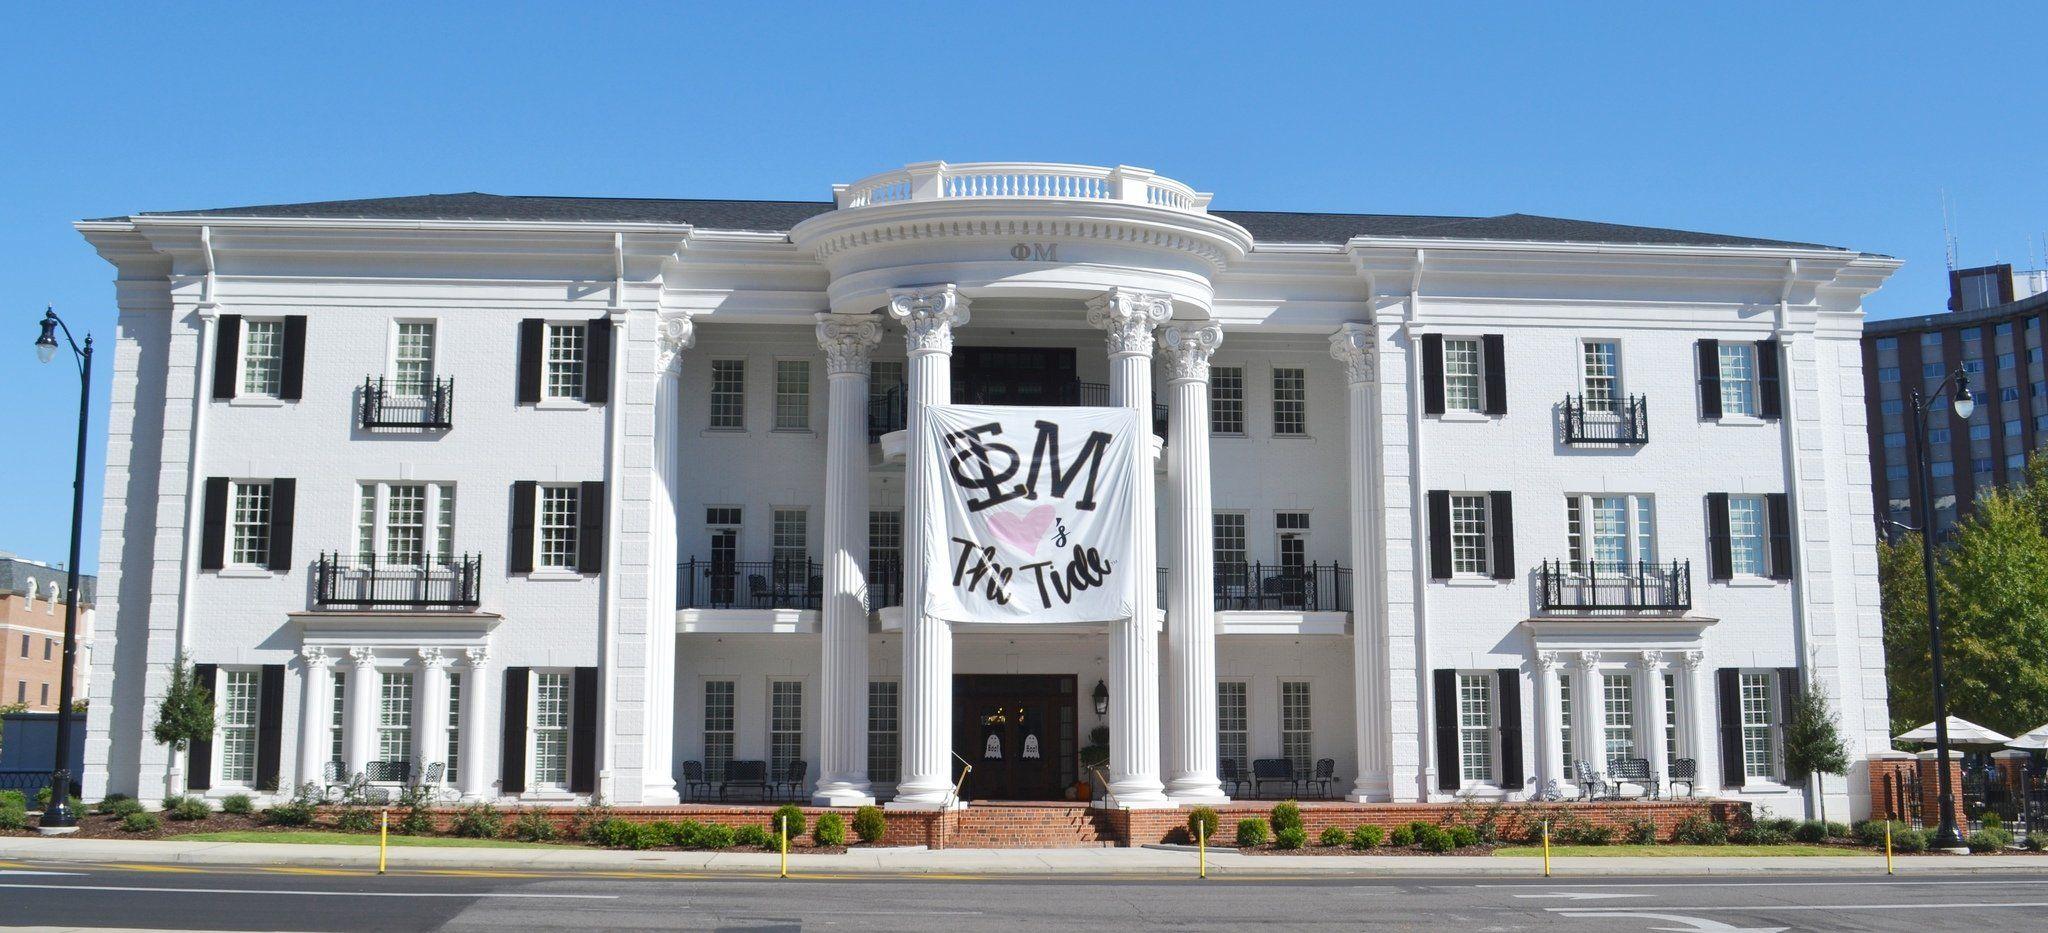 Best College Sororities in the U S  - Biggest and Oldest